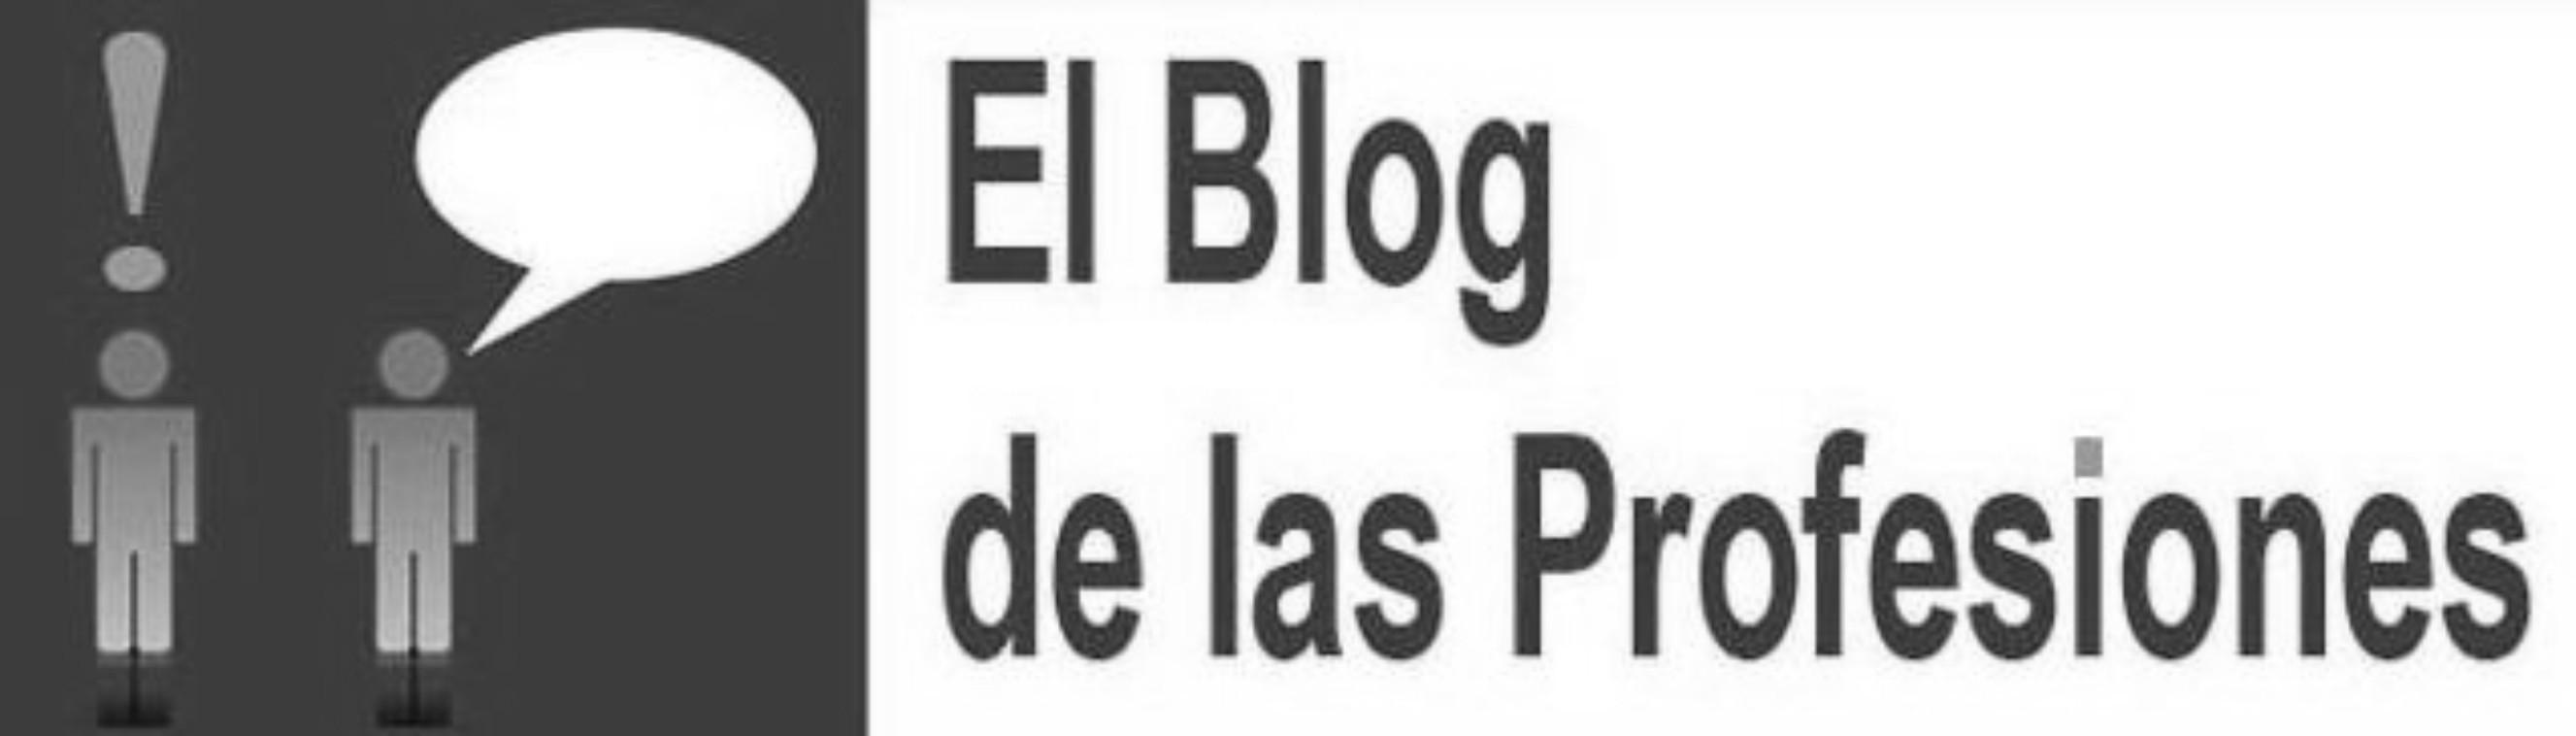 blog-profesiones_bn.jpg